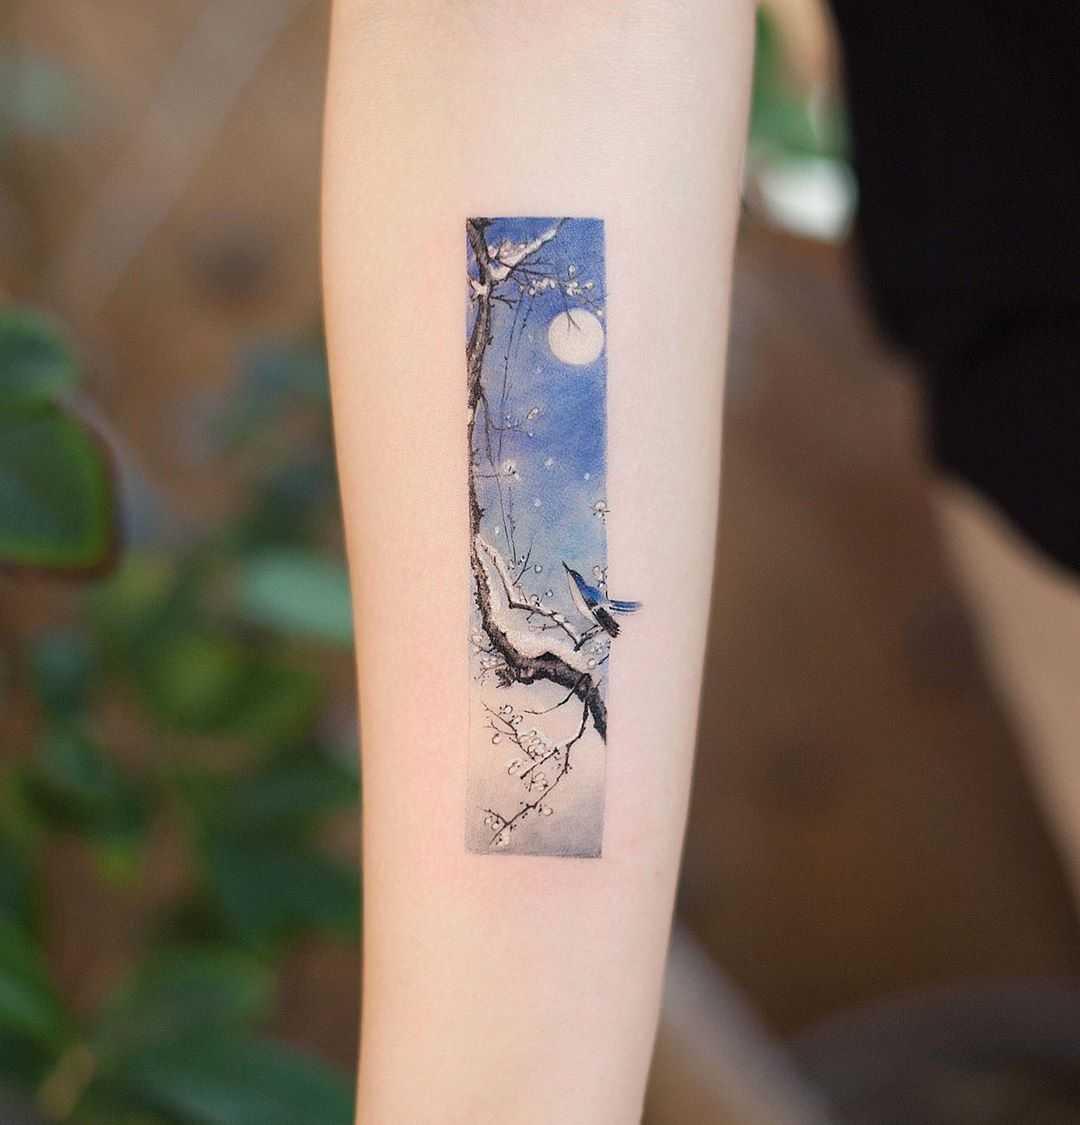 Winter frame by tattooist Franky